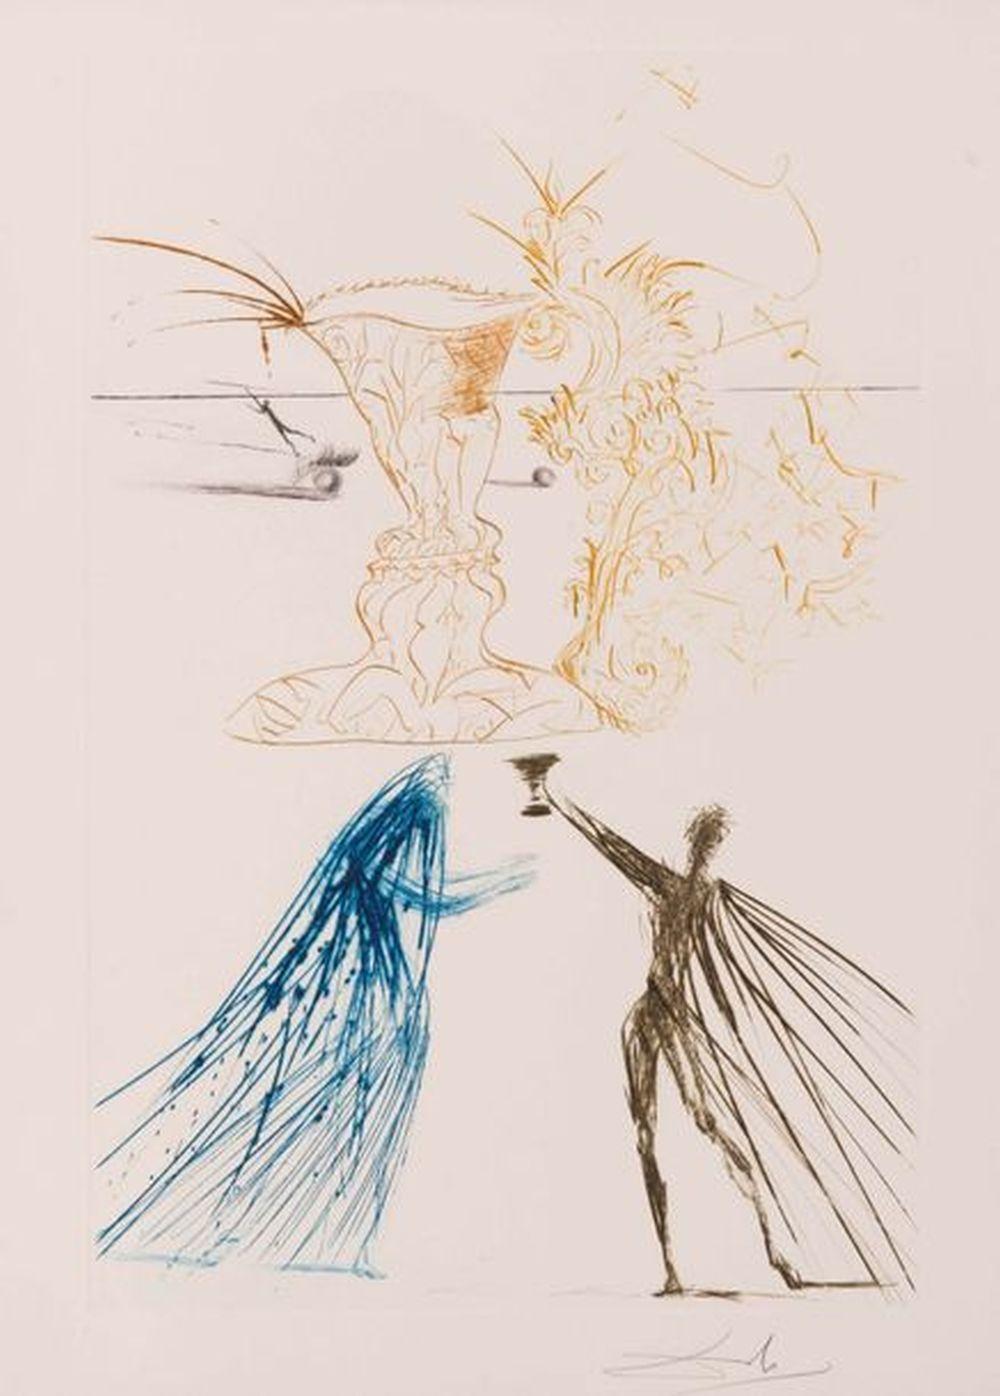 Salvador Dali - Tristan et Iseult, 1970